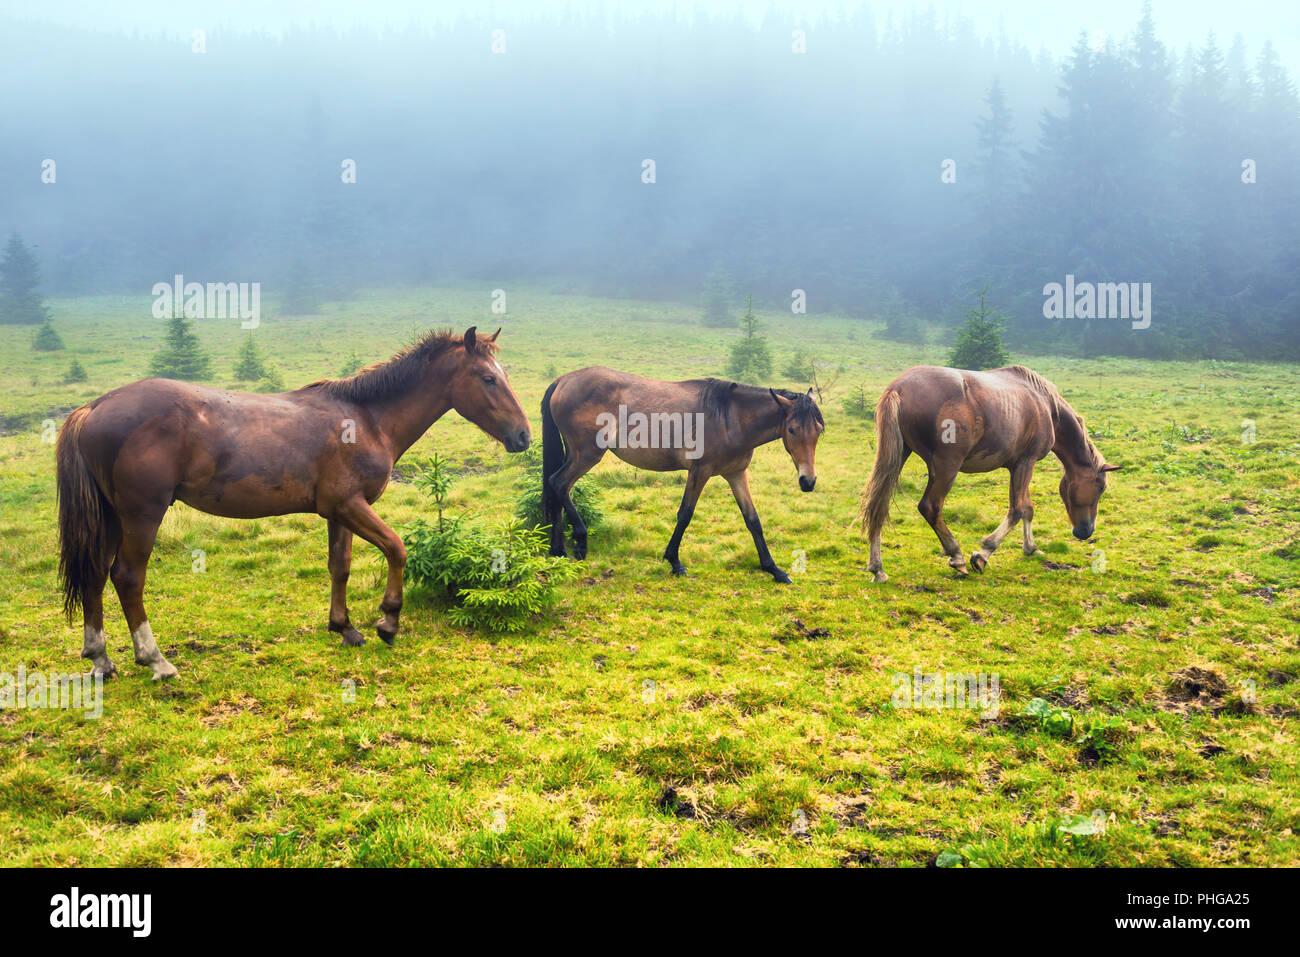 Herd of running brown horses - Stock Image